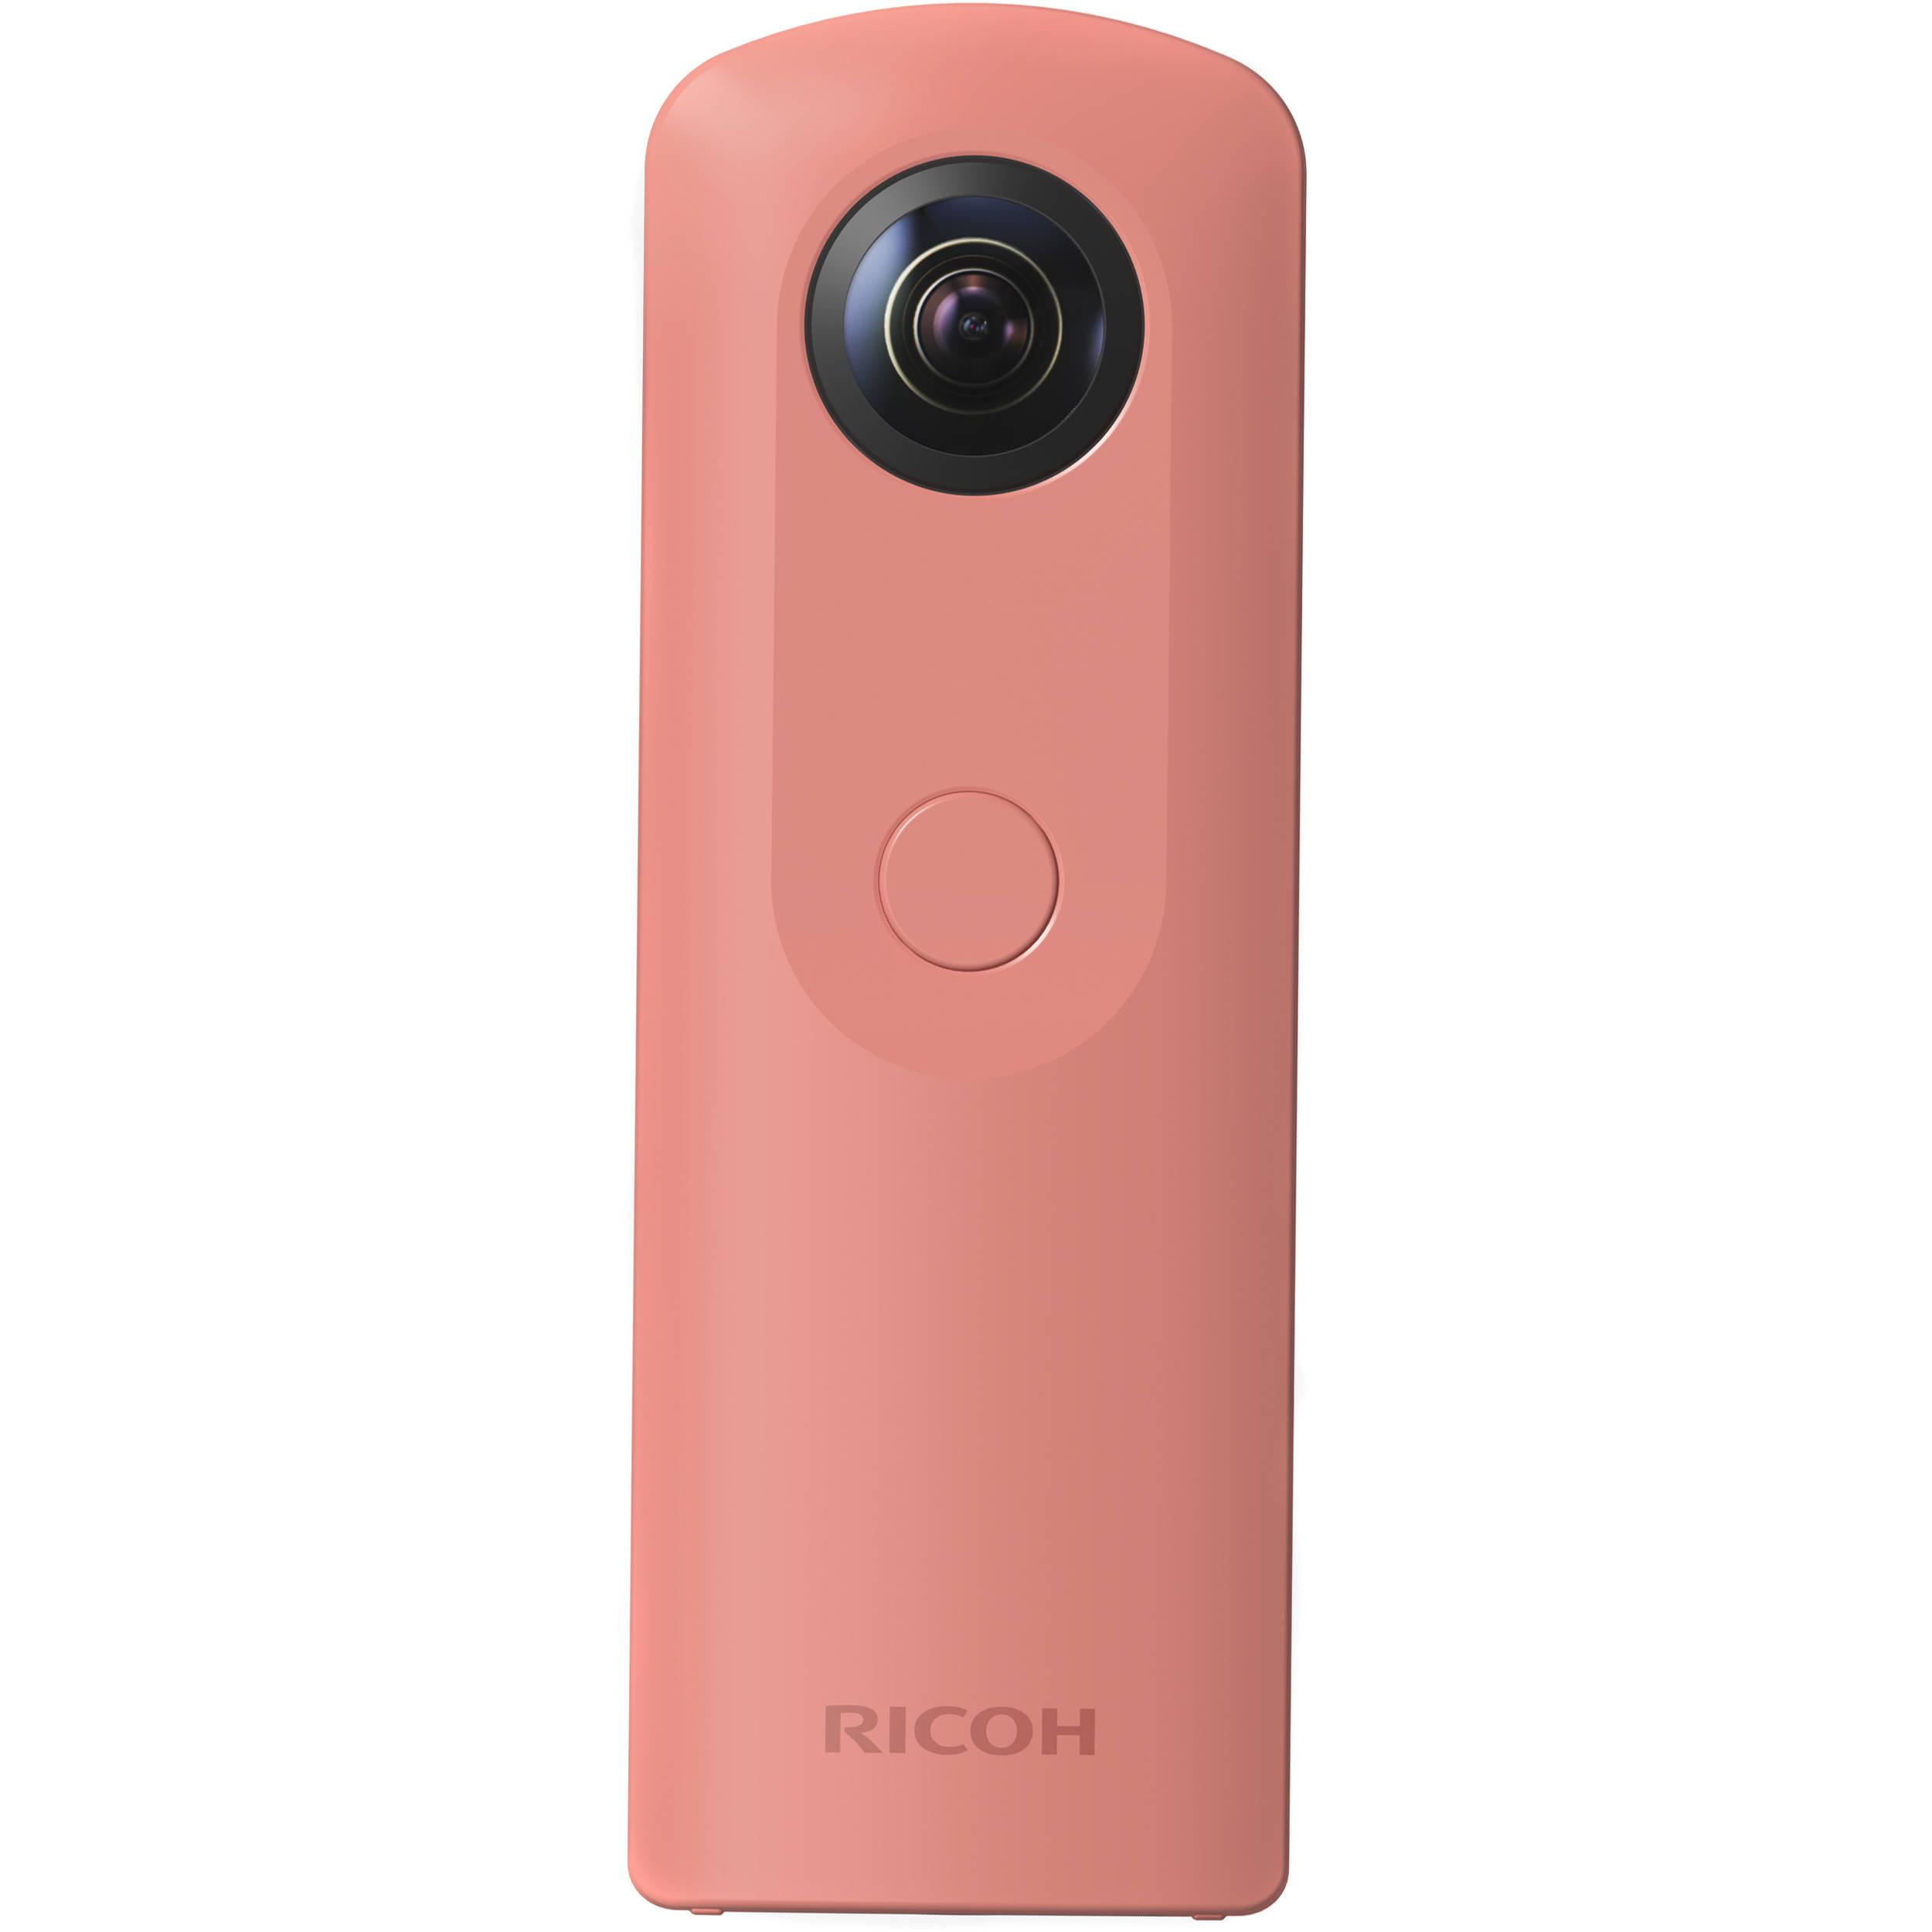 910741 - Ricoh Theta SC Spherical